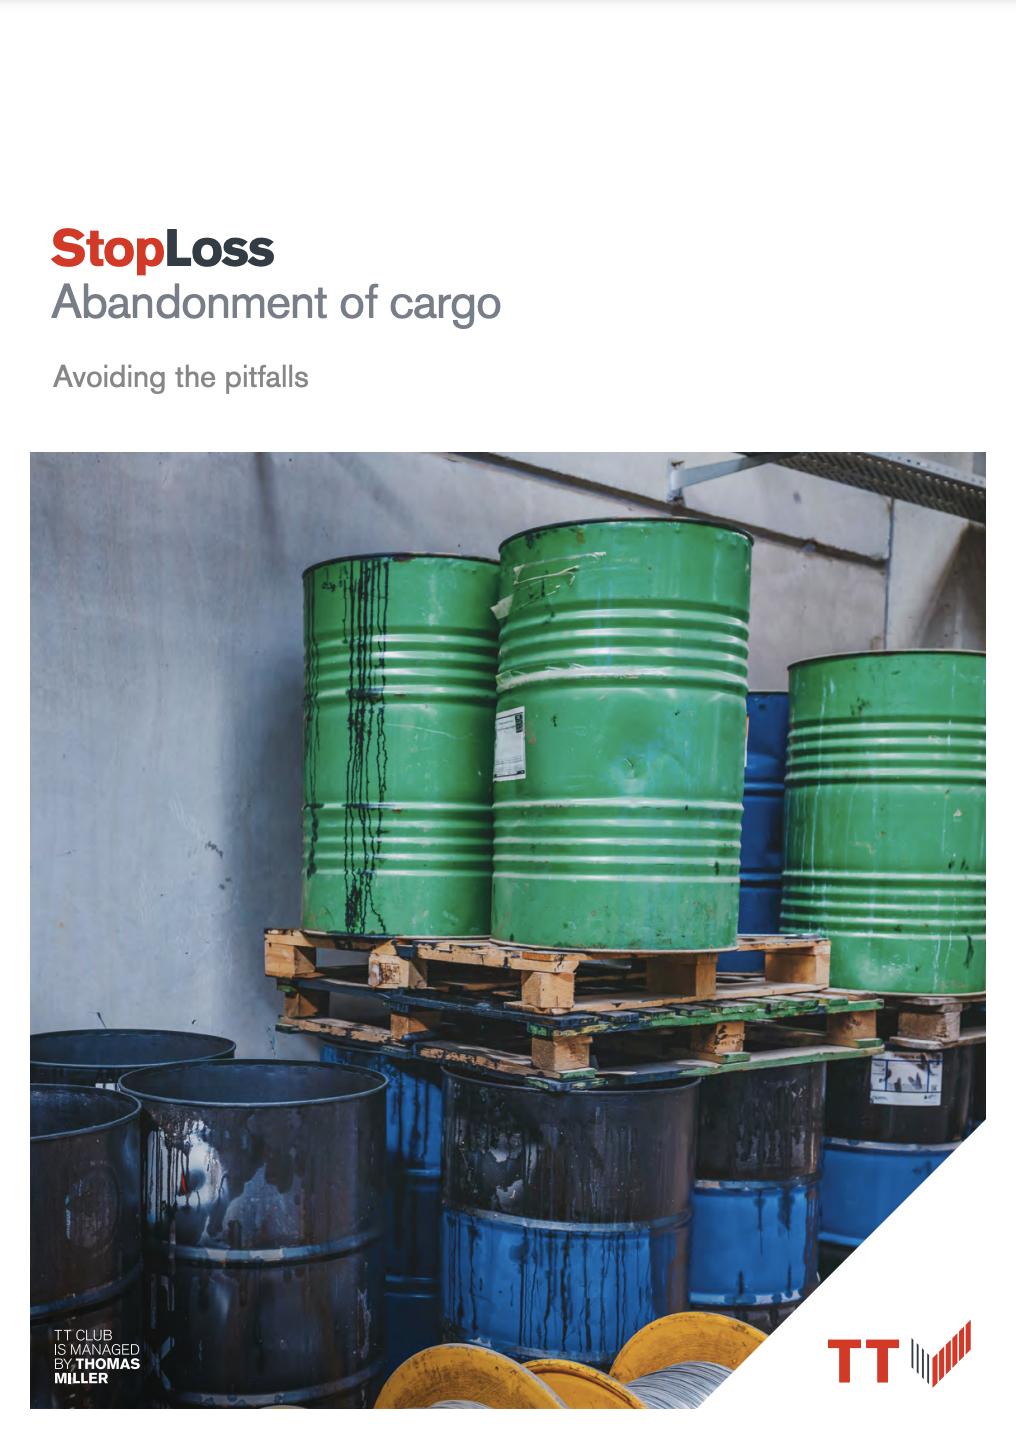 StopLoss: abandonment of cargo